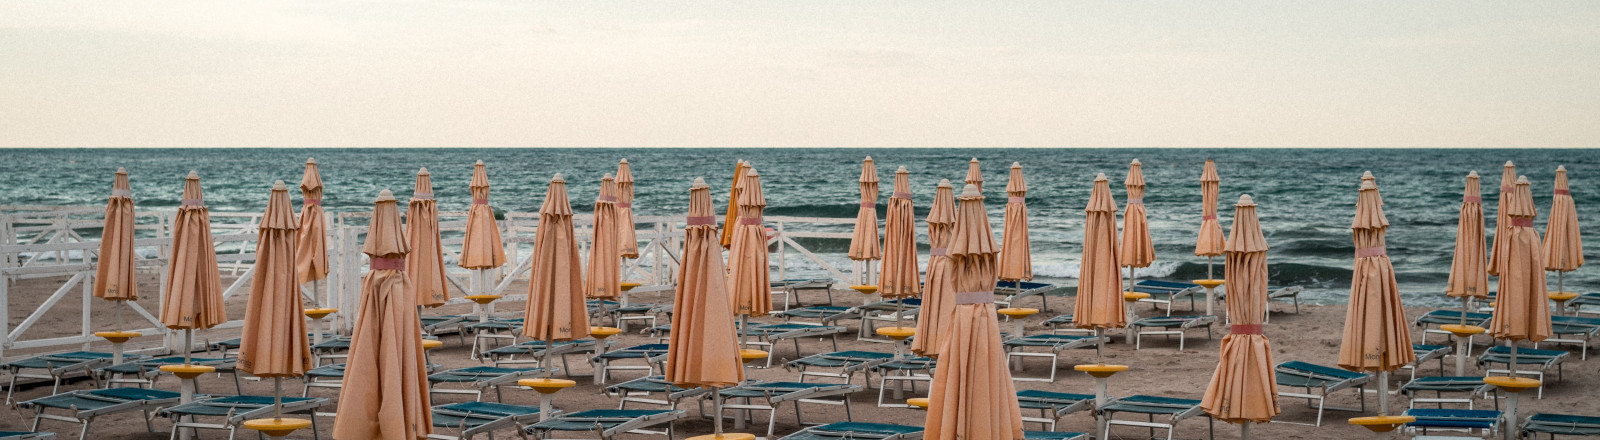 Leere Strandliegen bei Sonnenuntergang